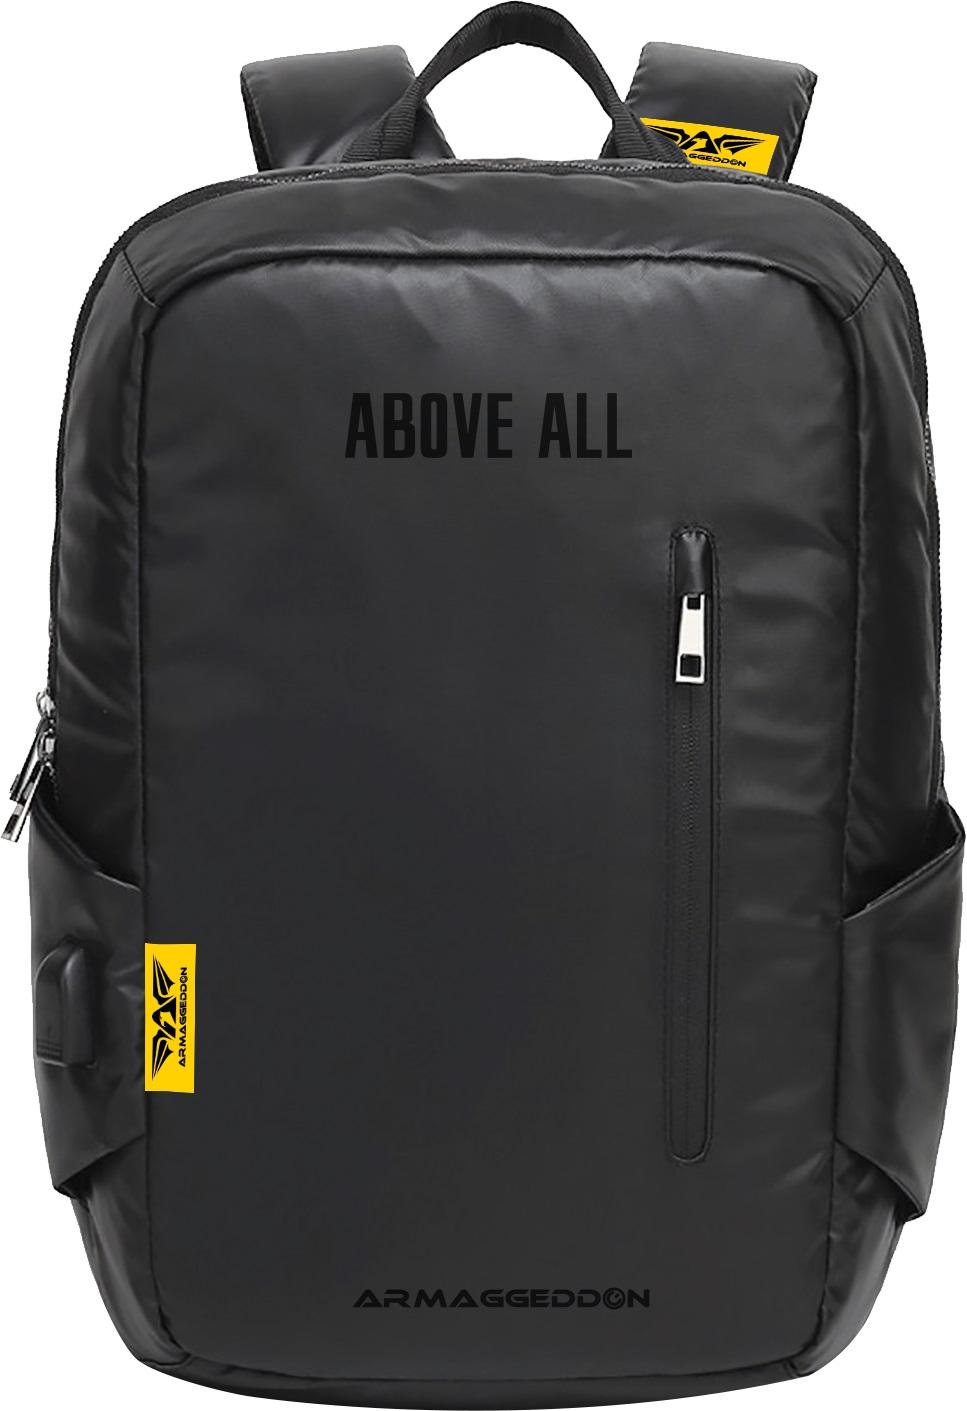 Armaggeddon SHIELD 5 Anti-Theft Gaming Bag Black